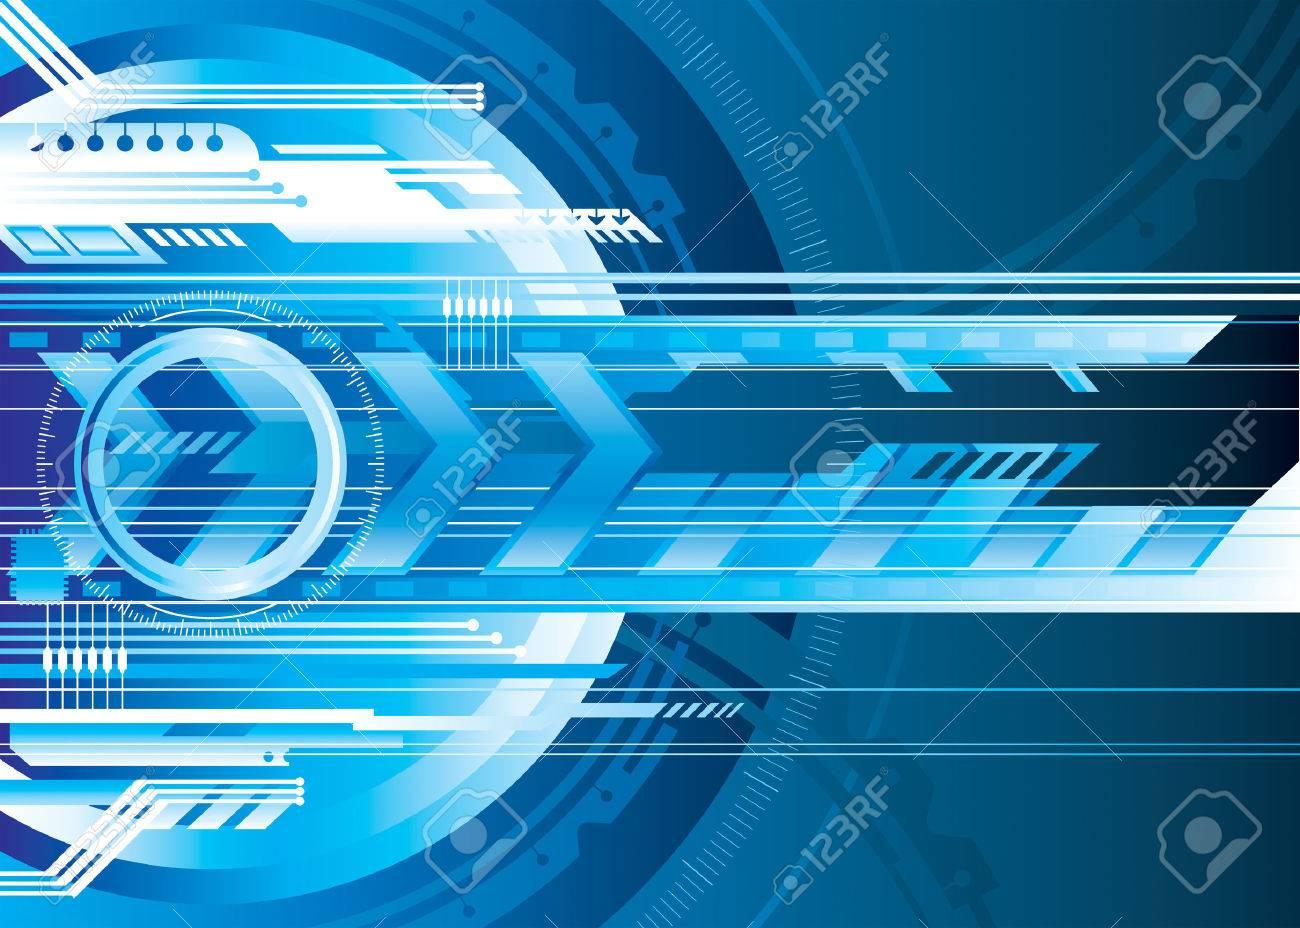 Blue Digital technology background, vector illustration layered. Stock Vector - 3945139